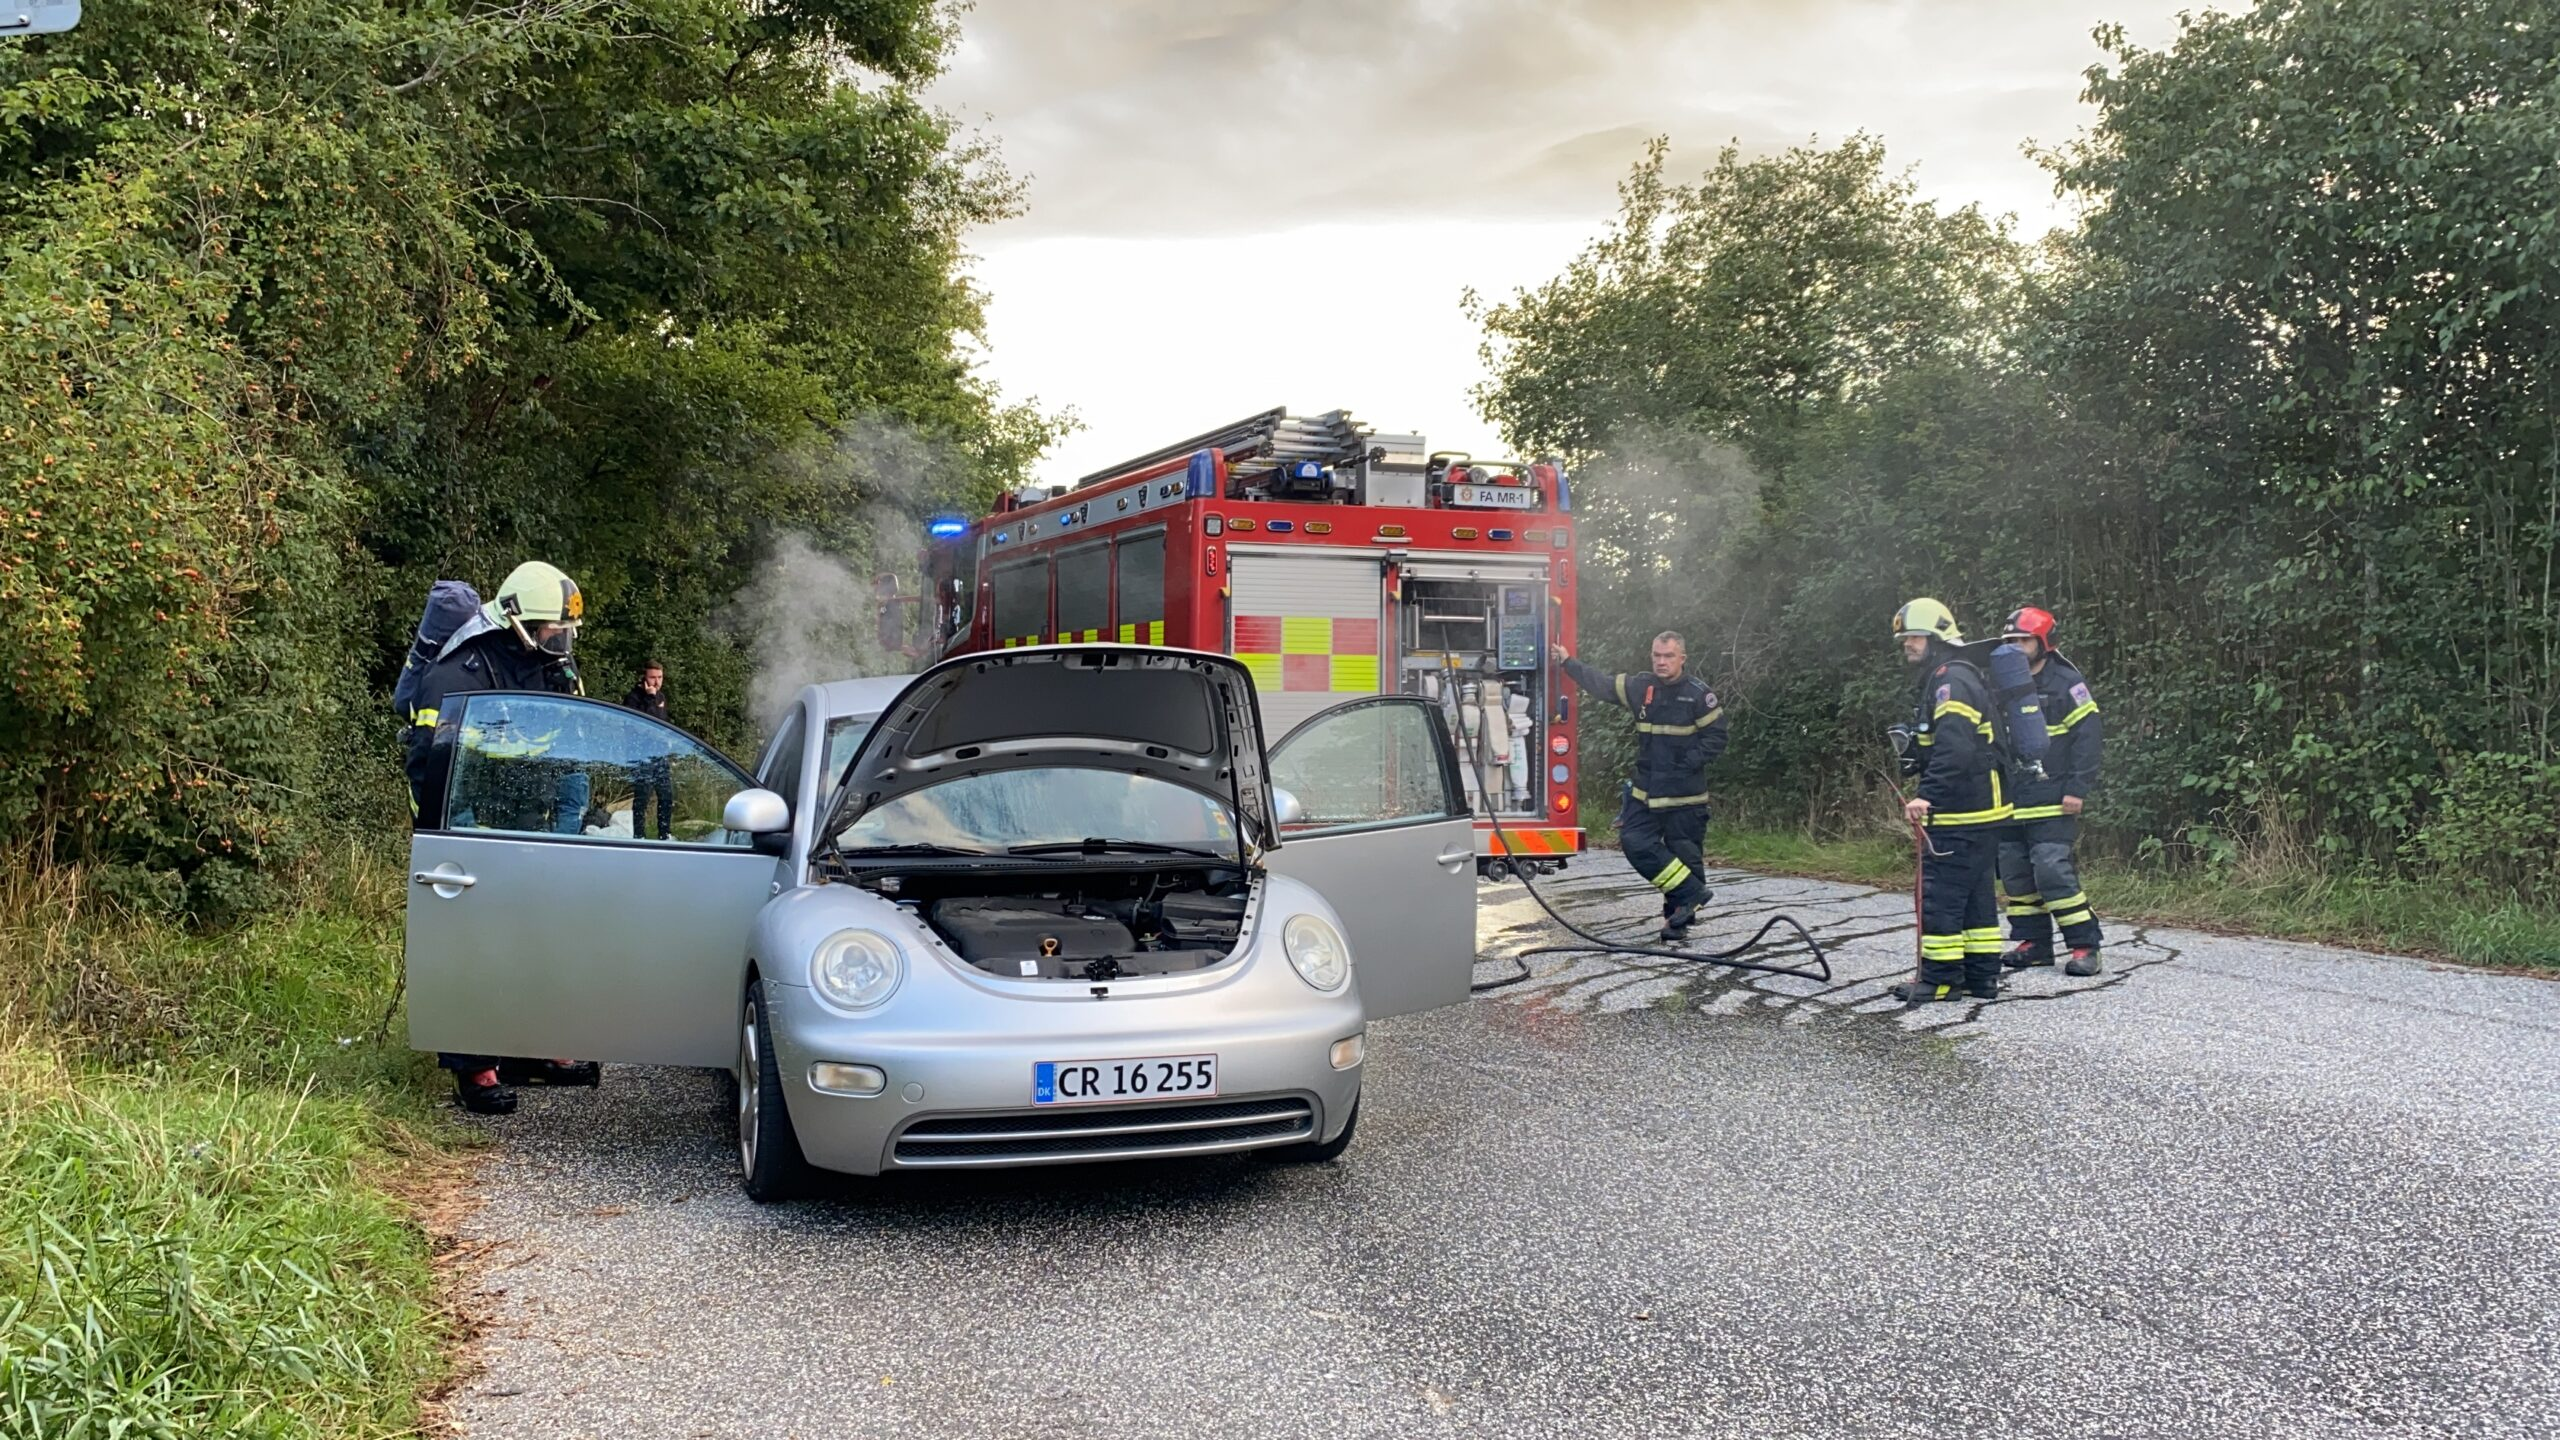 SE VIDEO: Bilbrand på rasteplads ved Egeskov